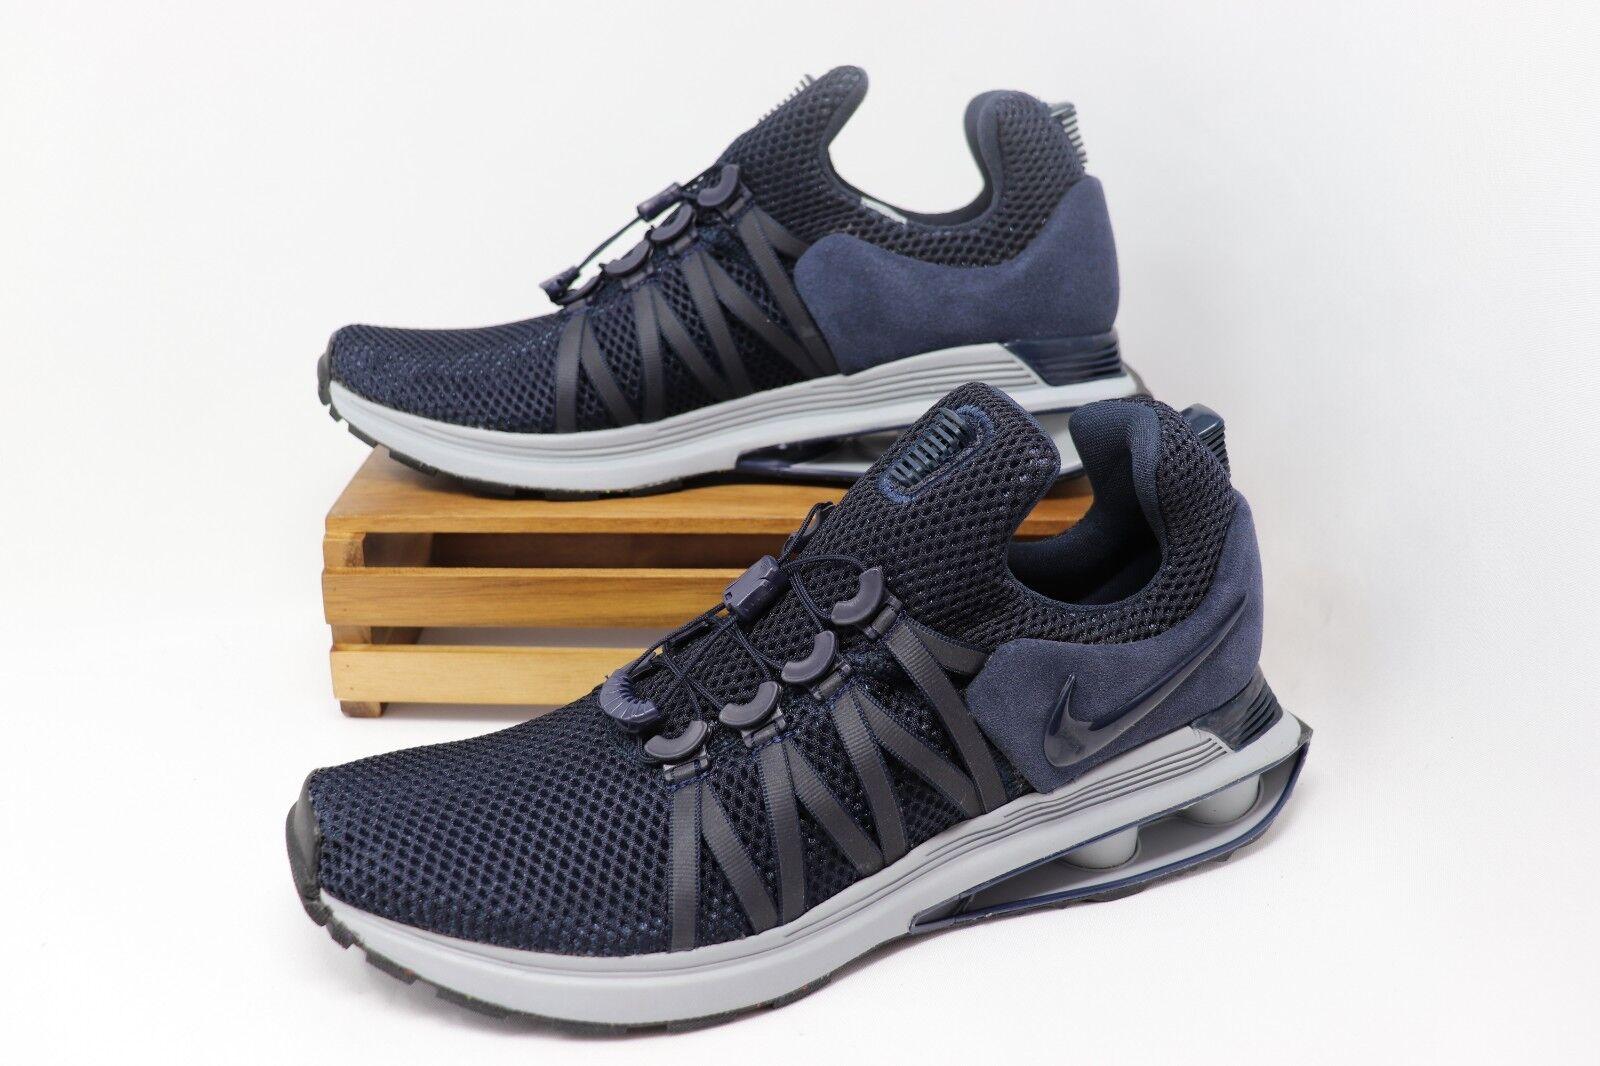 Nike Shox Gravity Running shoes Navy bluee White AR1999-402 Men's NWOB